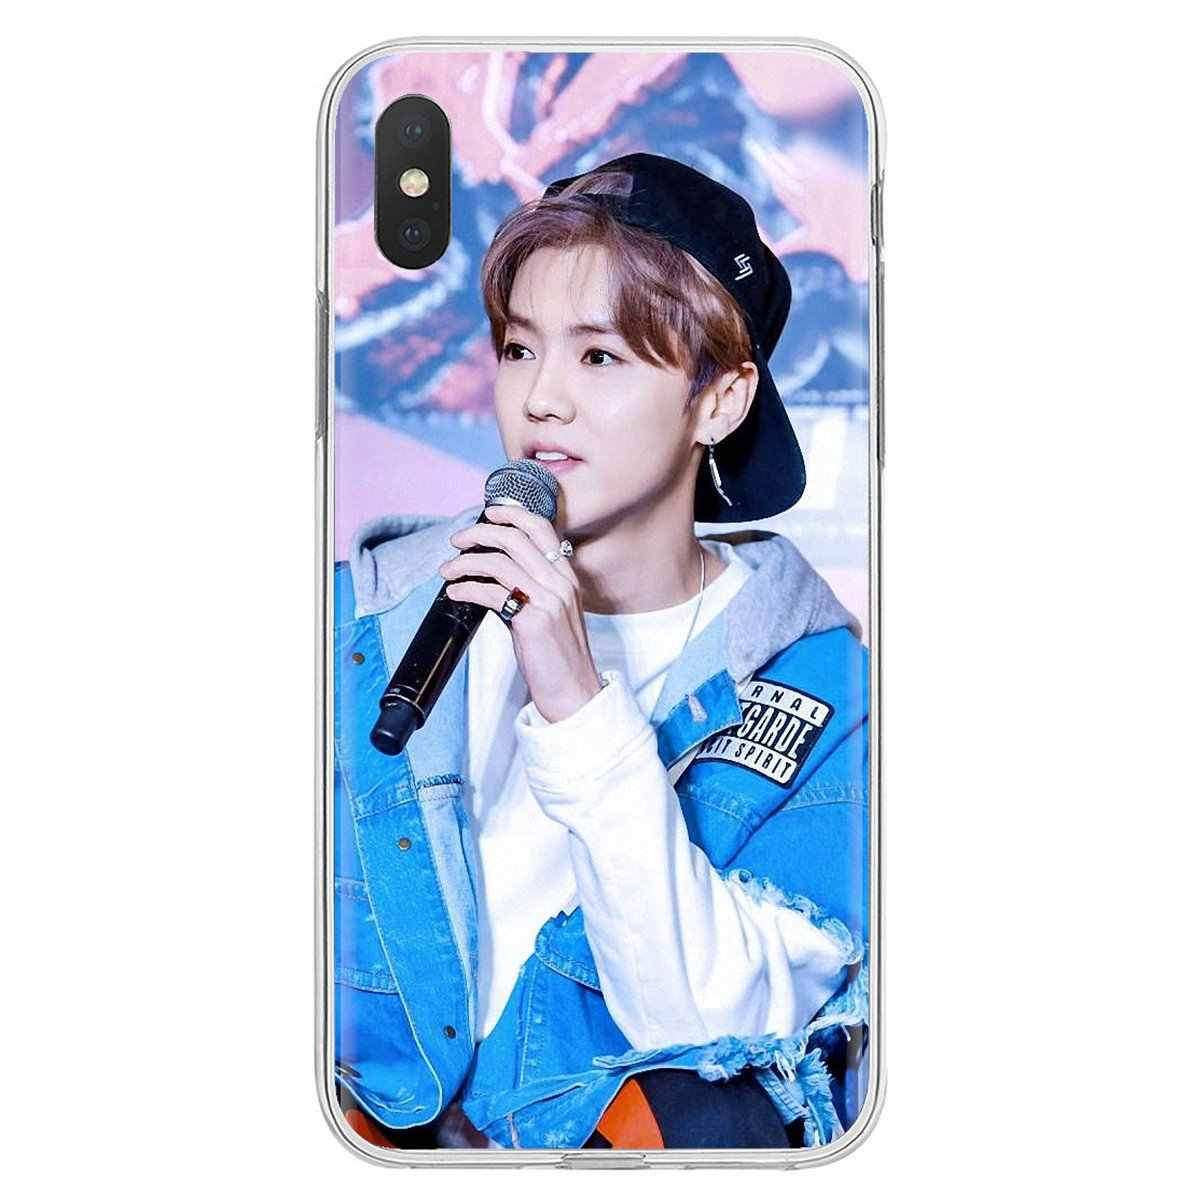 Exo lay suho luhan oh se hun smartphone silicone caso de telefone para bq aquaris c u2 u v x2 x lite pro plus e4.5 m4.5 x5 e5 4g m 2017